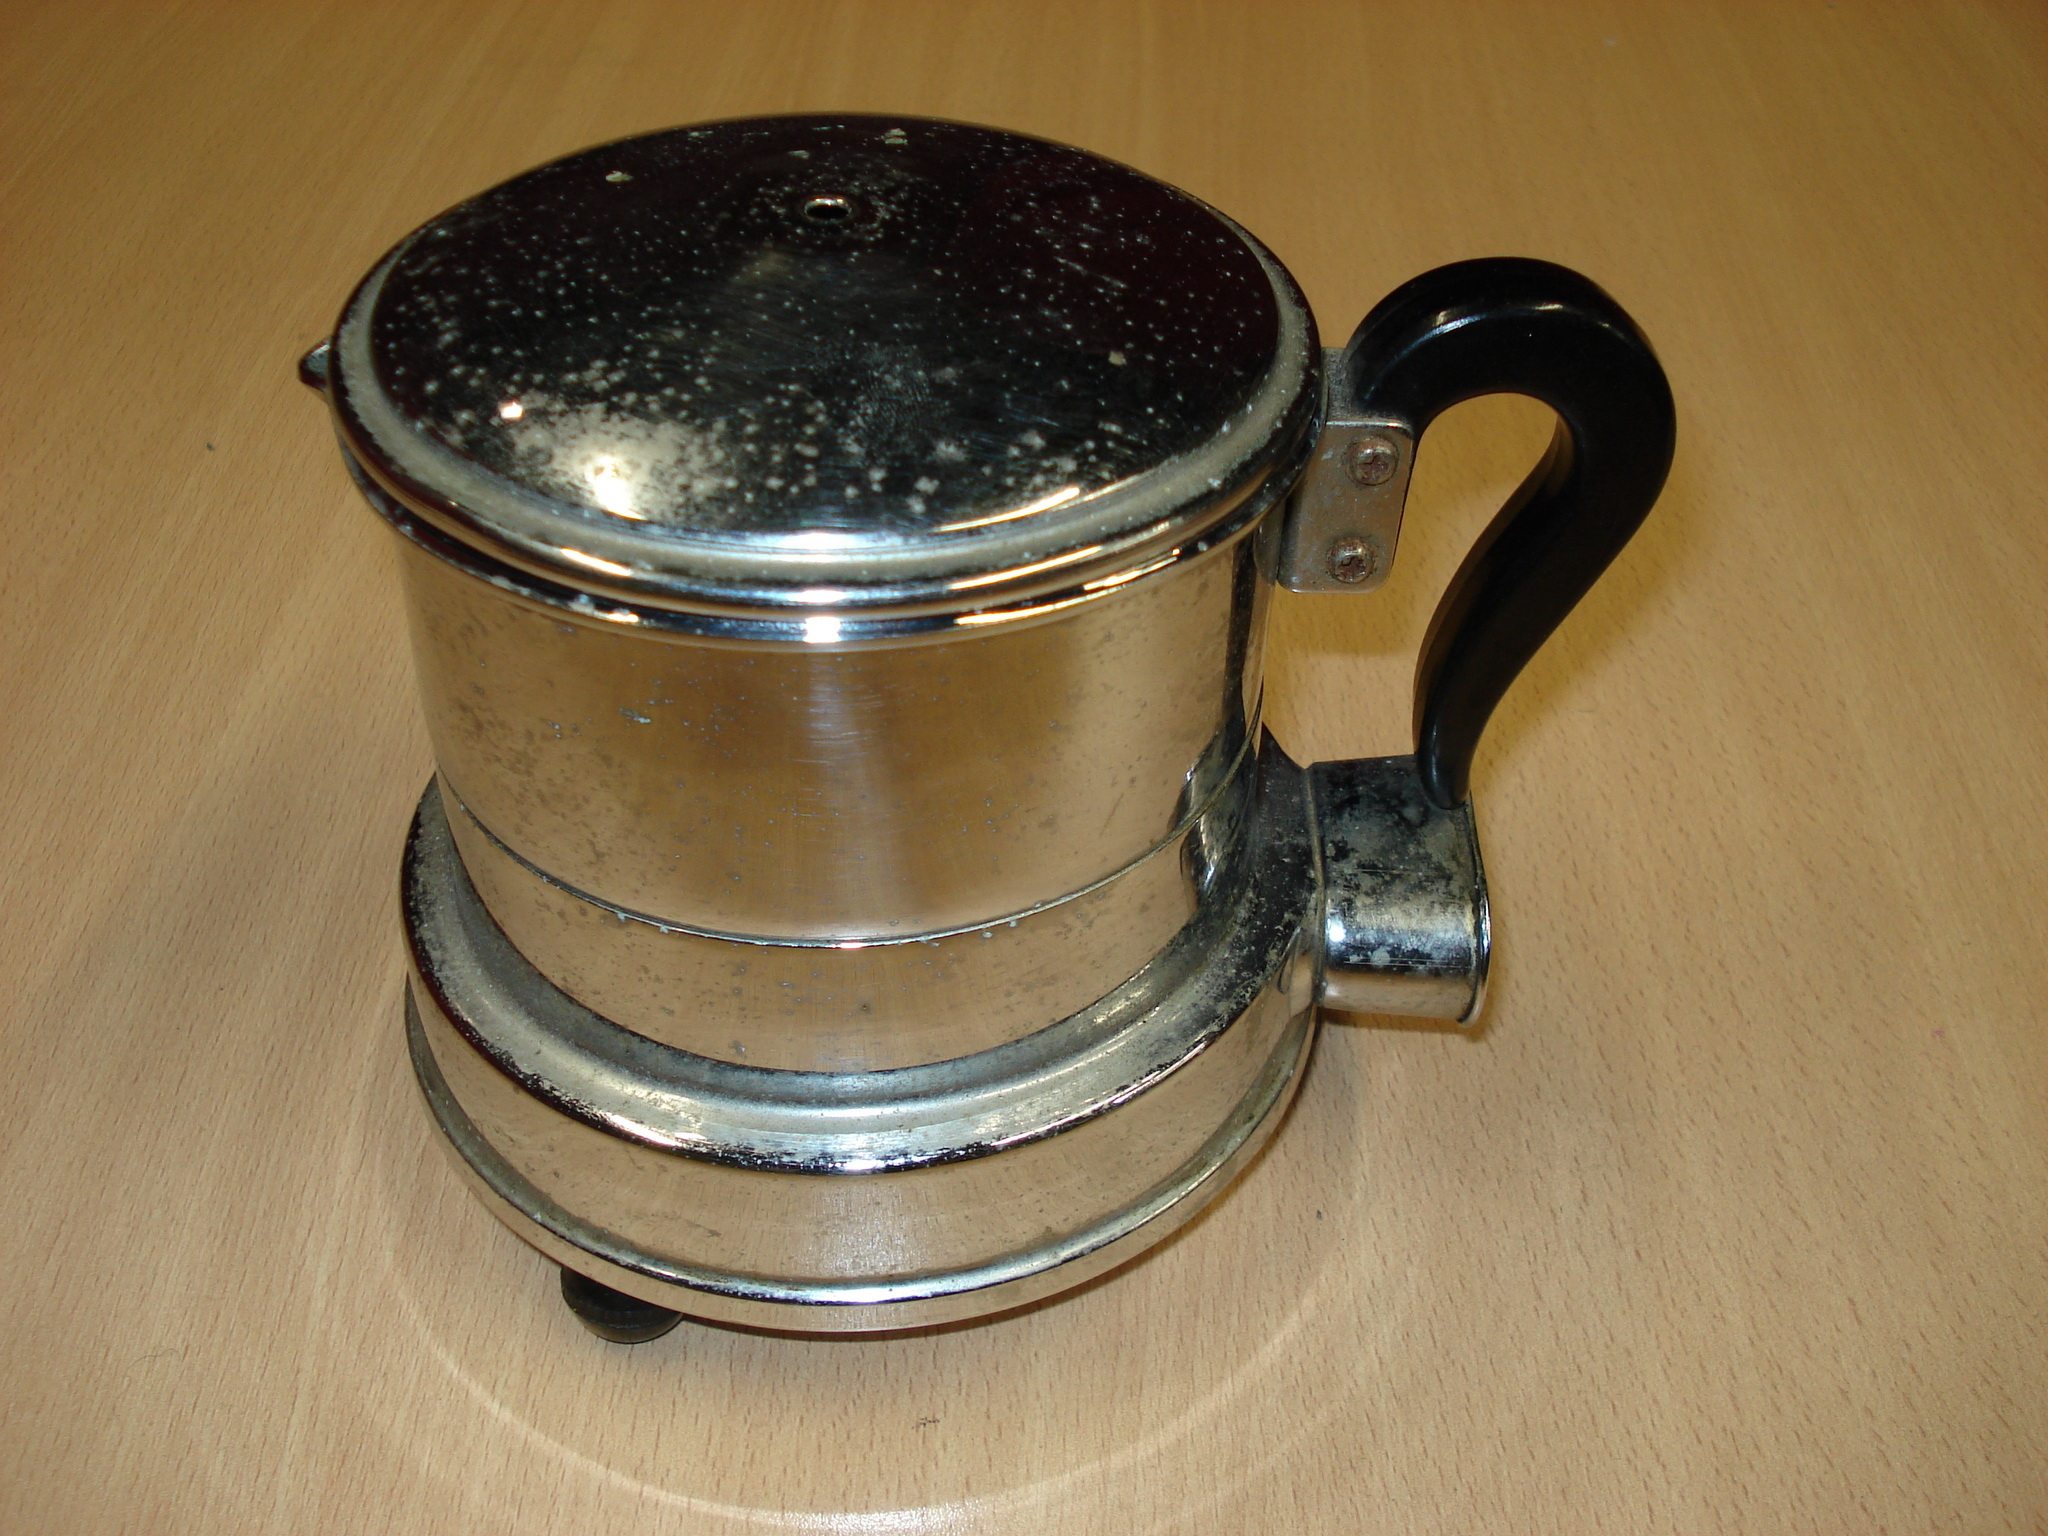 Calentador de leche eléctrico JATA Mod. 253